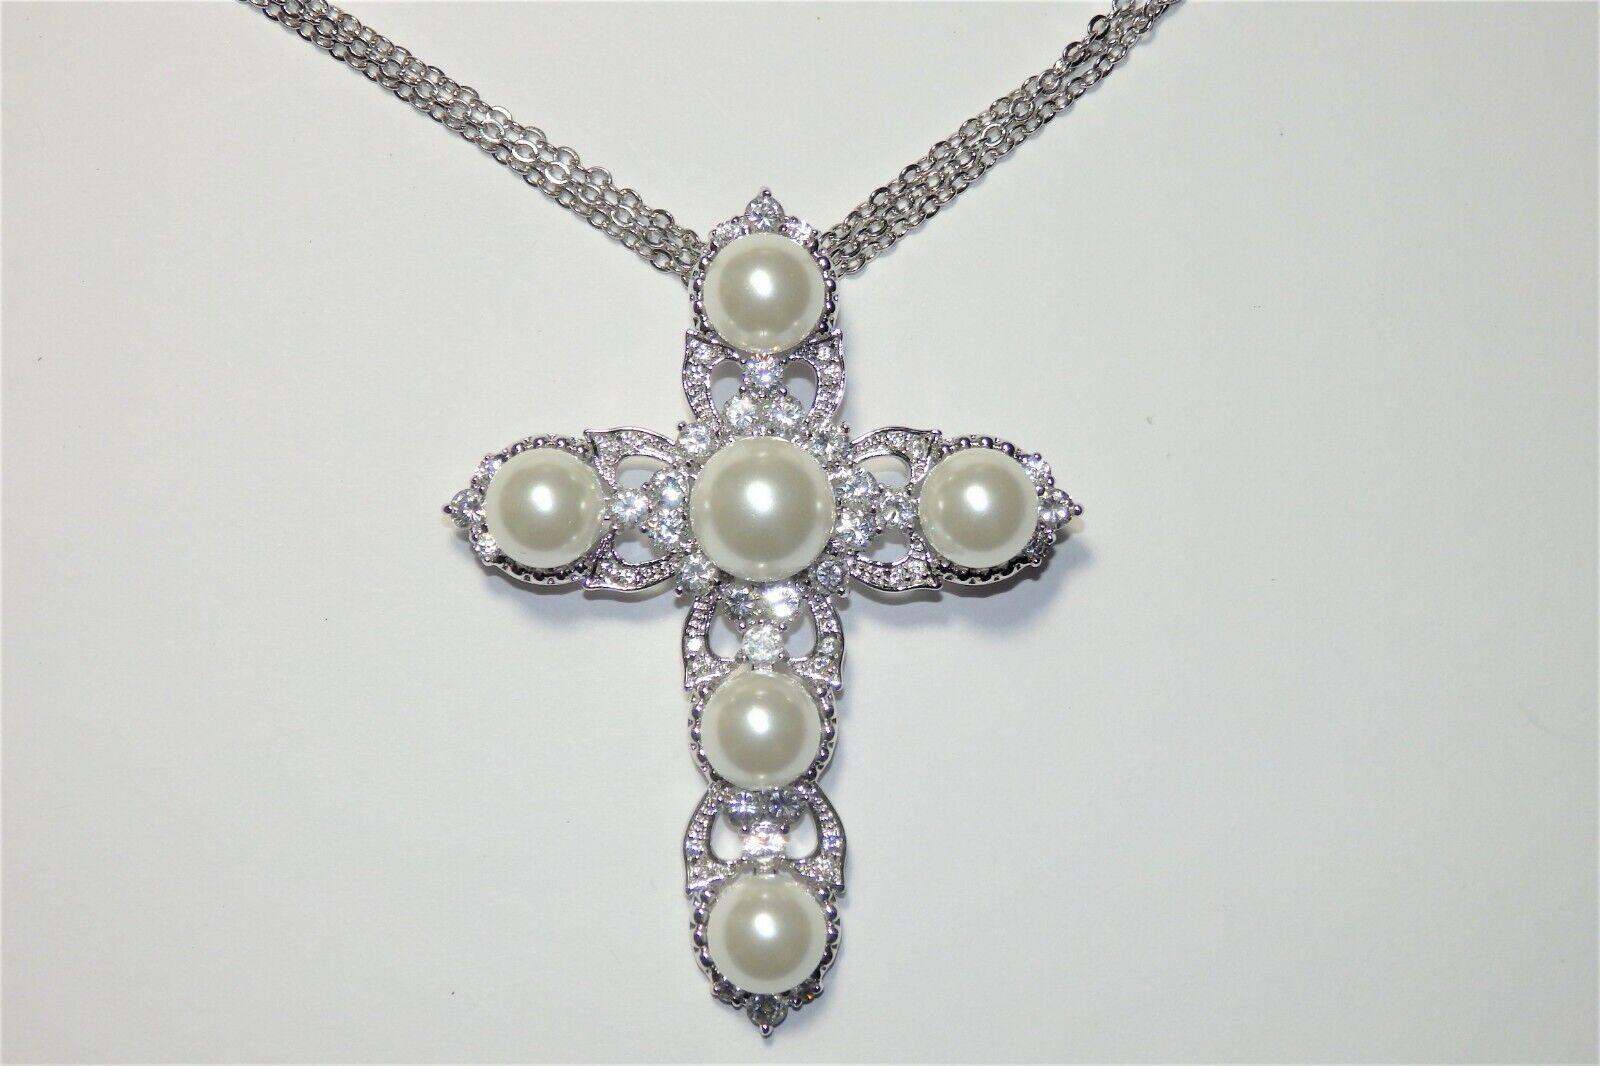 Rare JOAN BOYCE Crystal Rhinestone & Faux Pearl C… - image 8